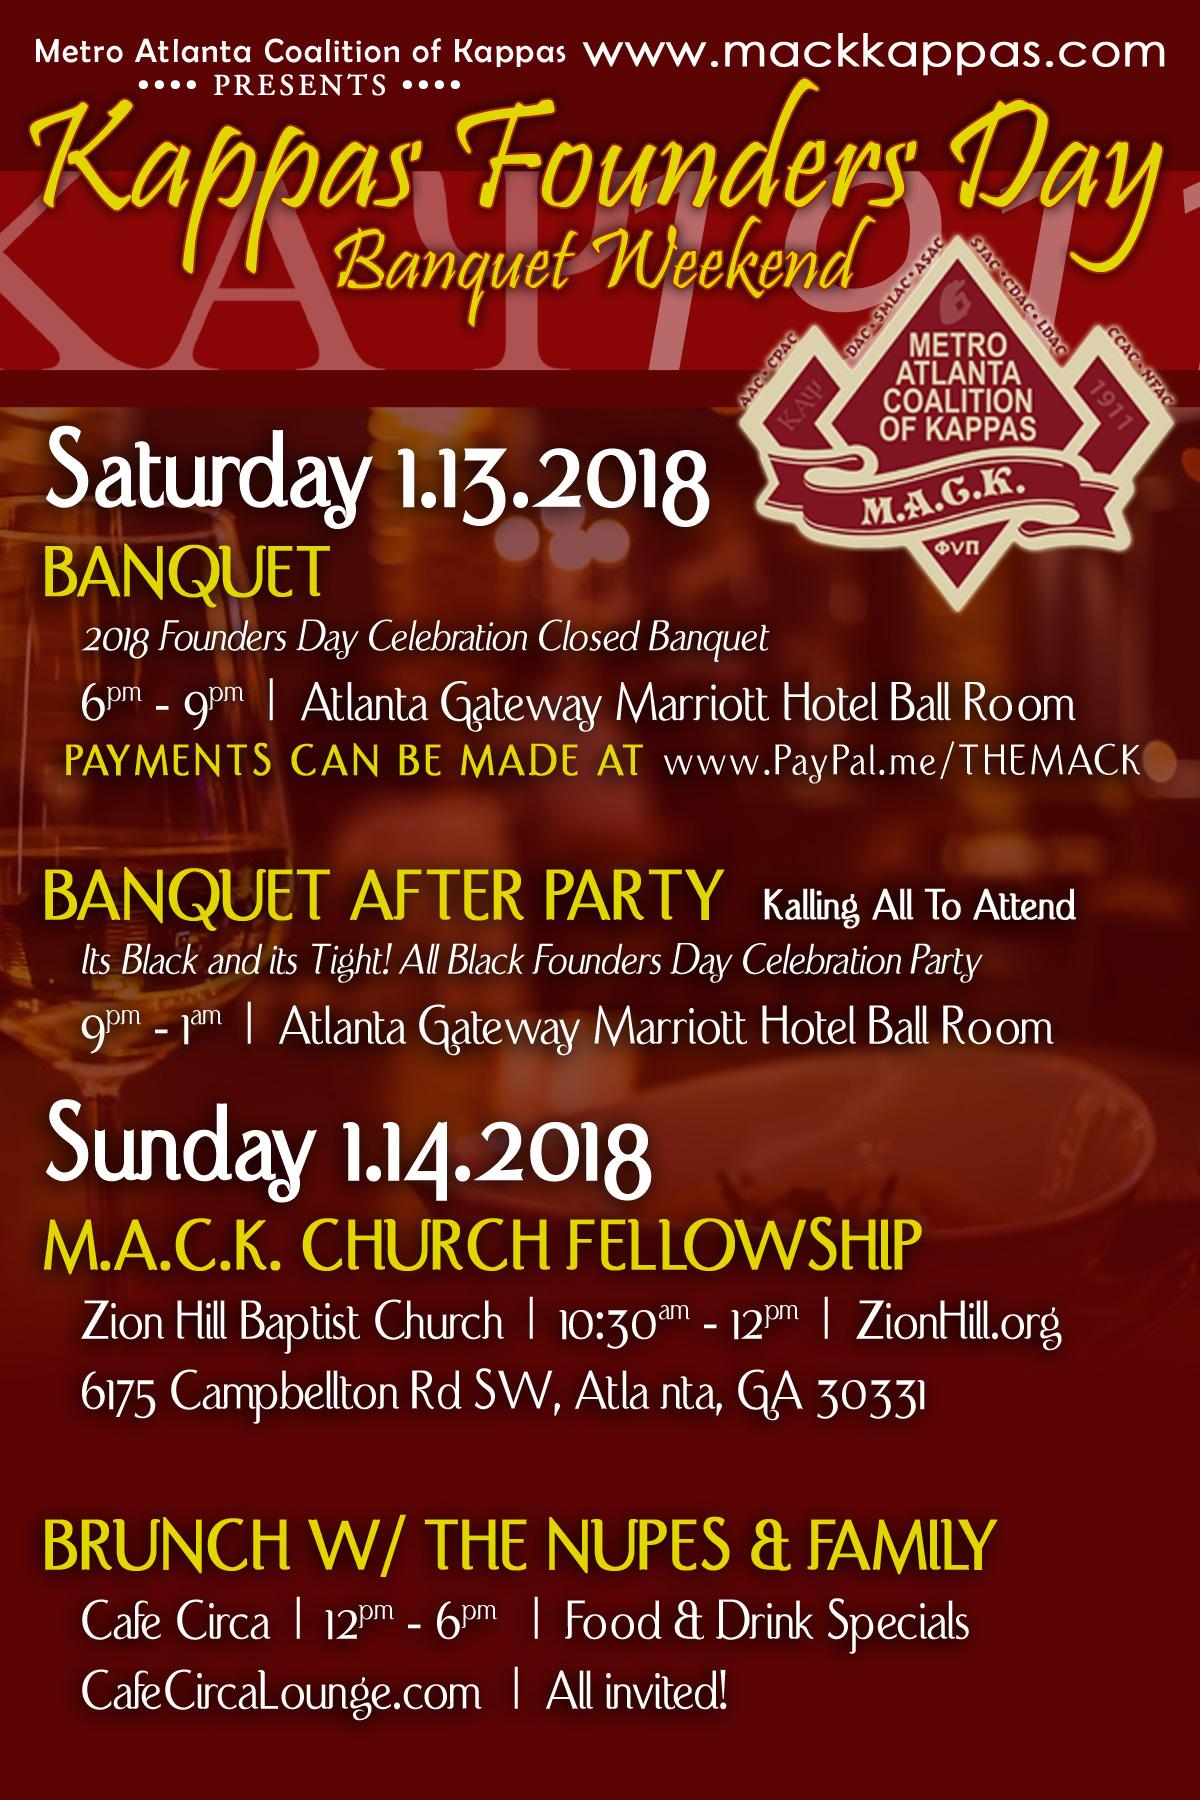 MACK Founders Day Weekend Flyer